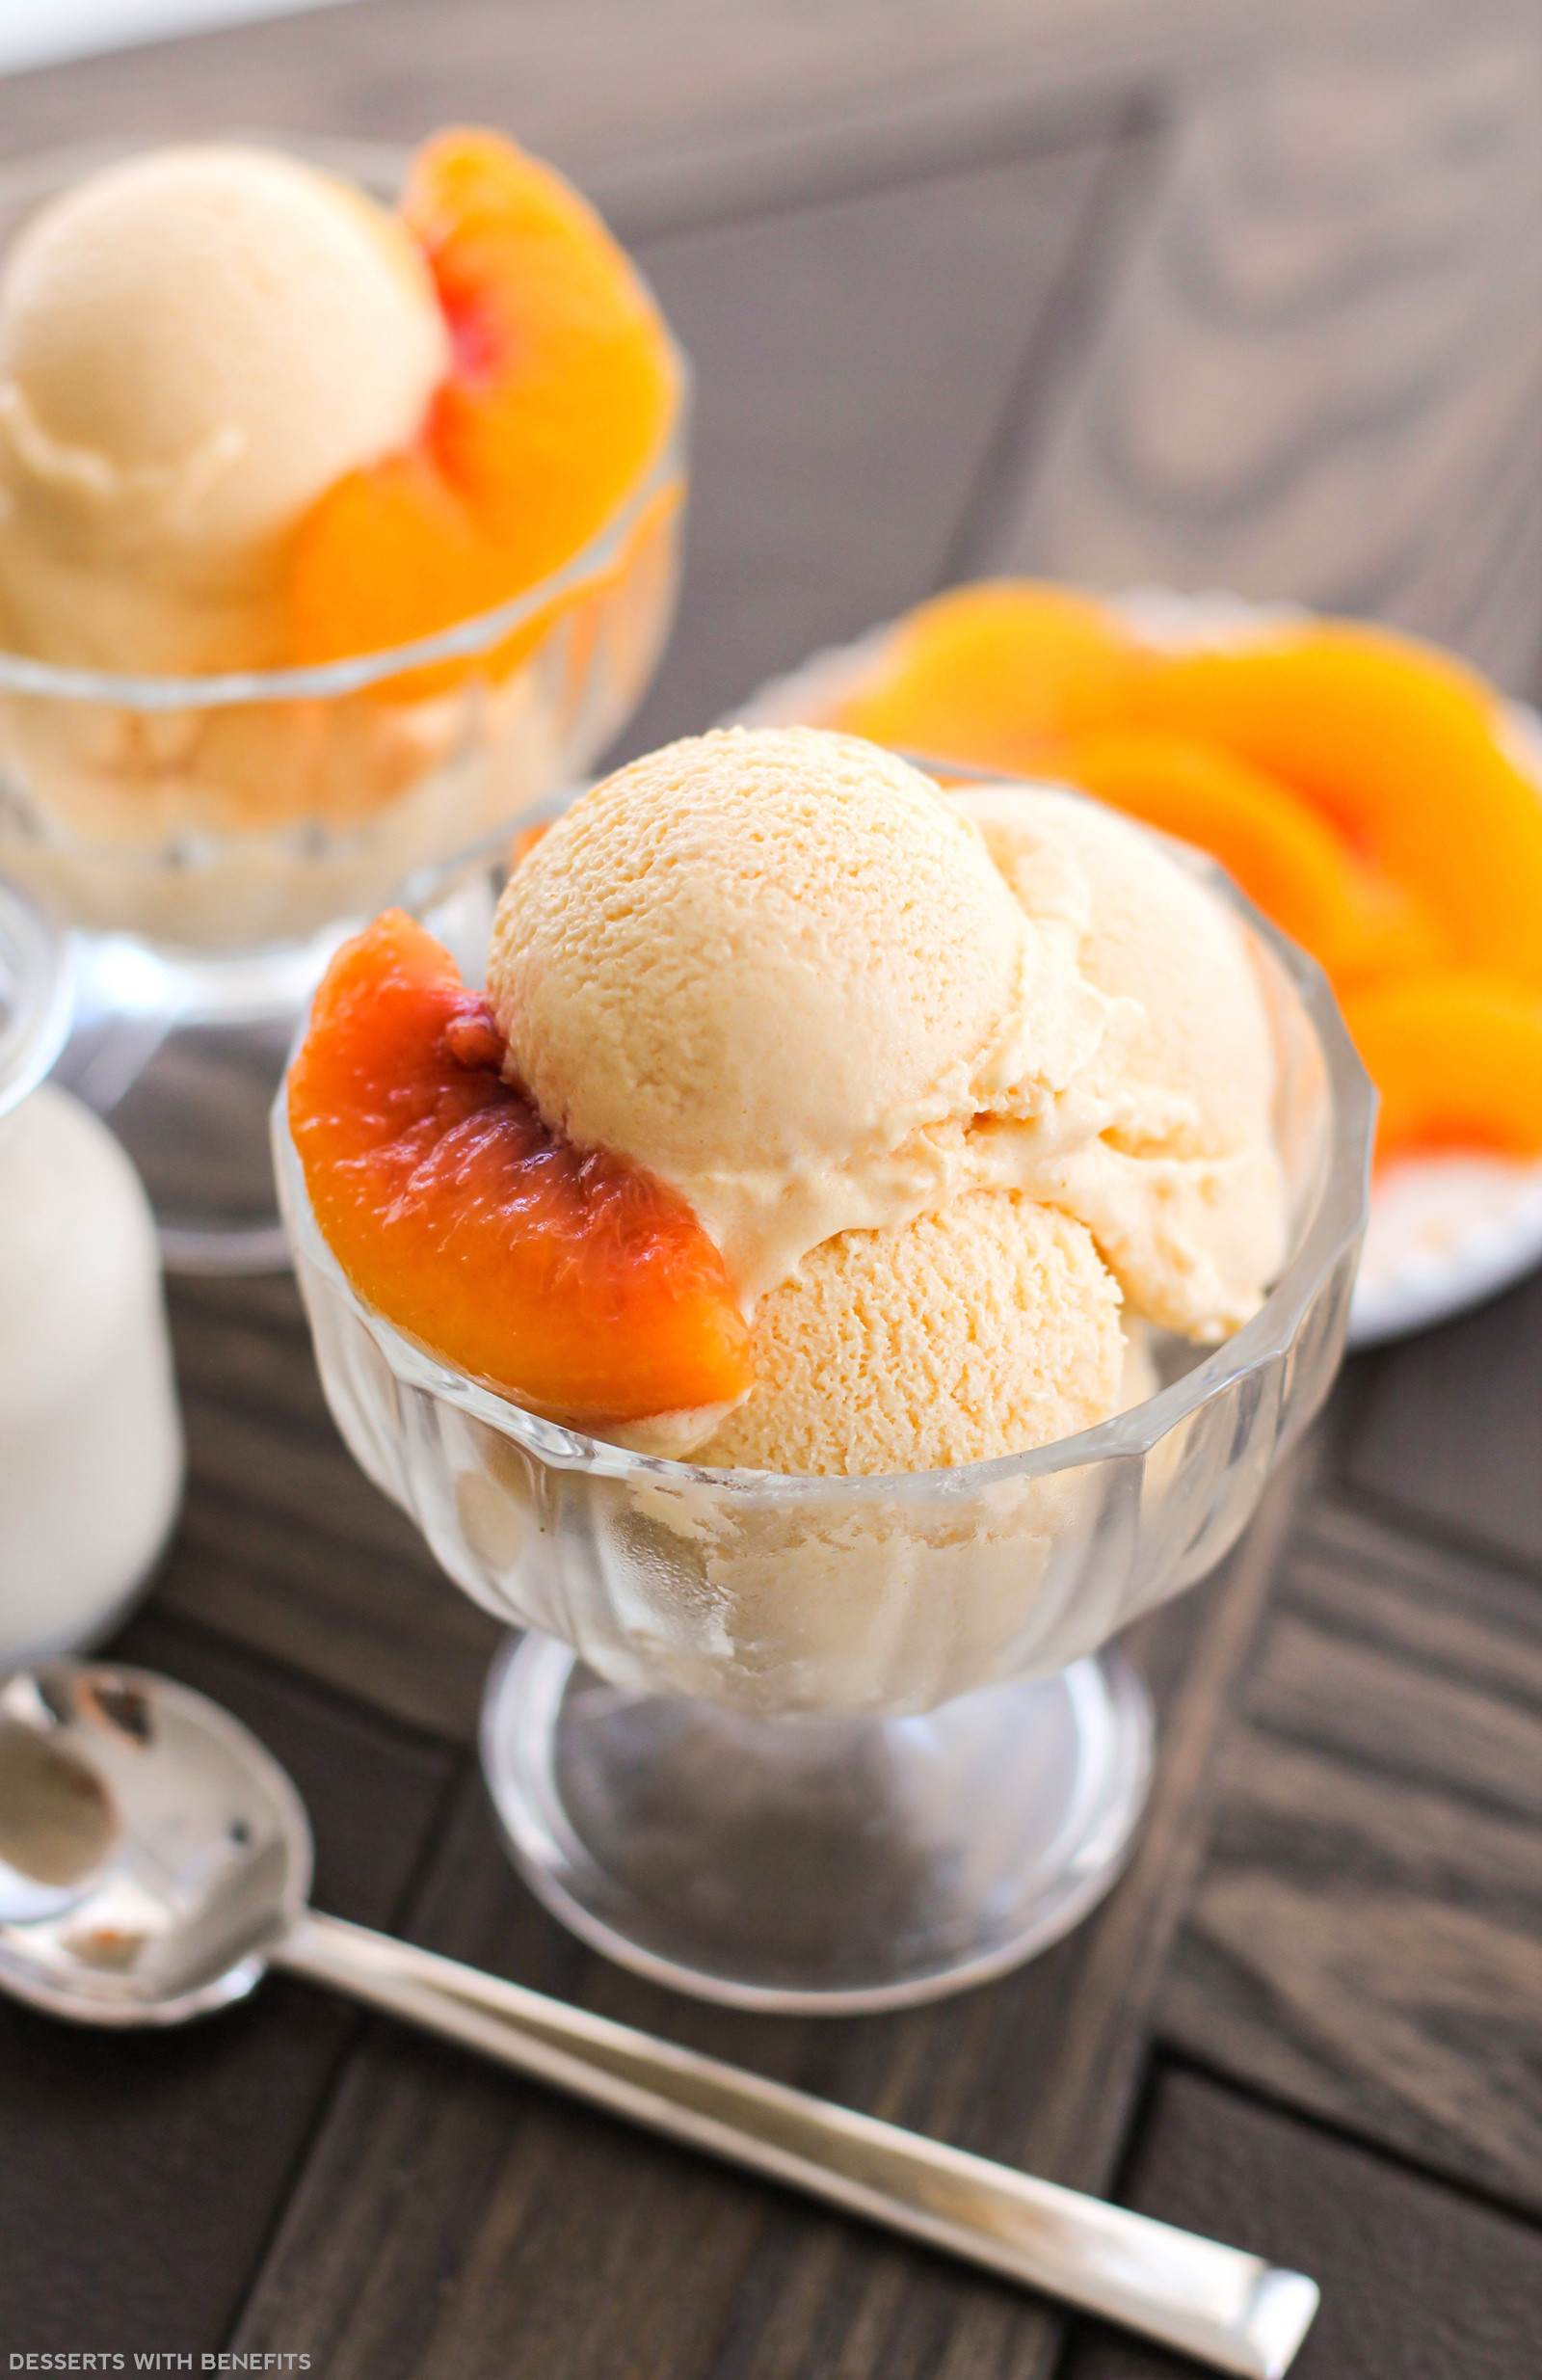 Healthy Peach Dessert Recipes 20 Best Ideas Healthy Peaches and Cream Ice Cream Recipe No Sugar Added